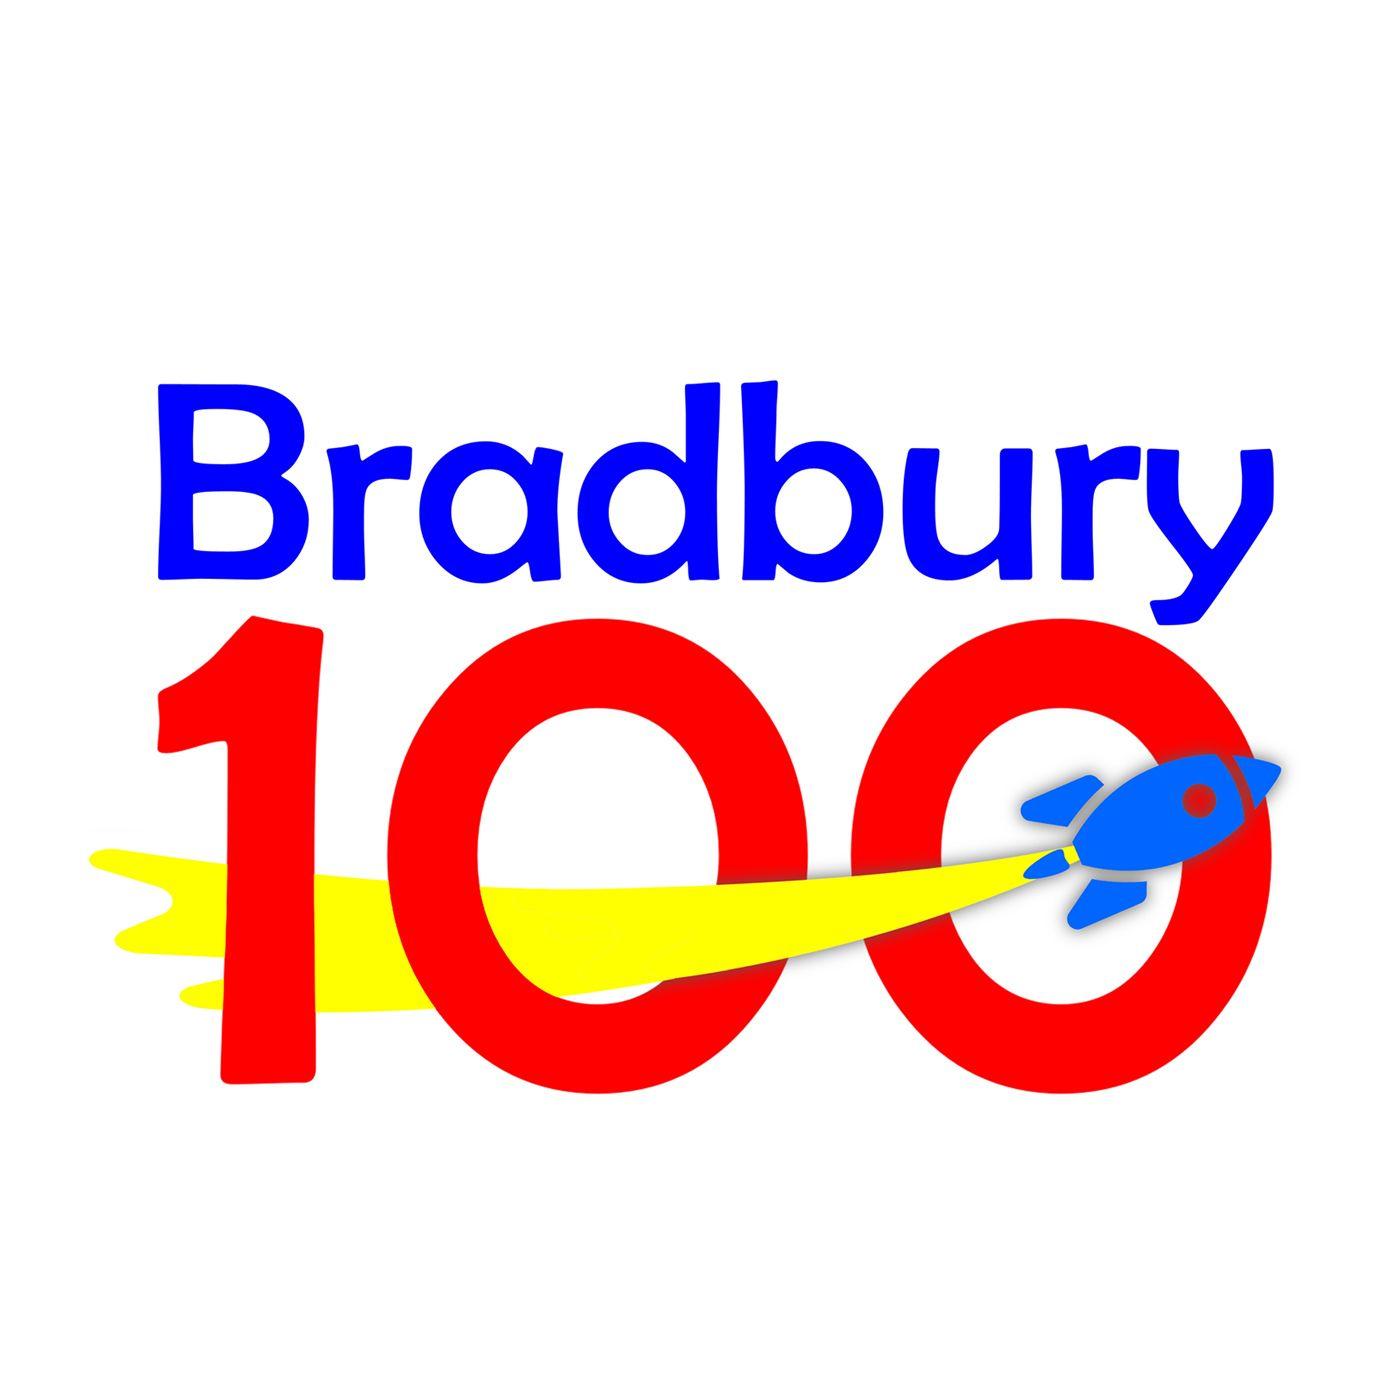 Bradbury 100 - episode 18 - with science fiction writer Howard V. Hendrix